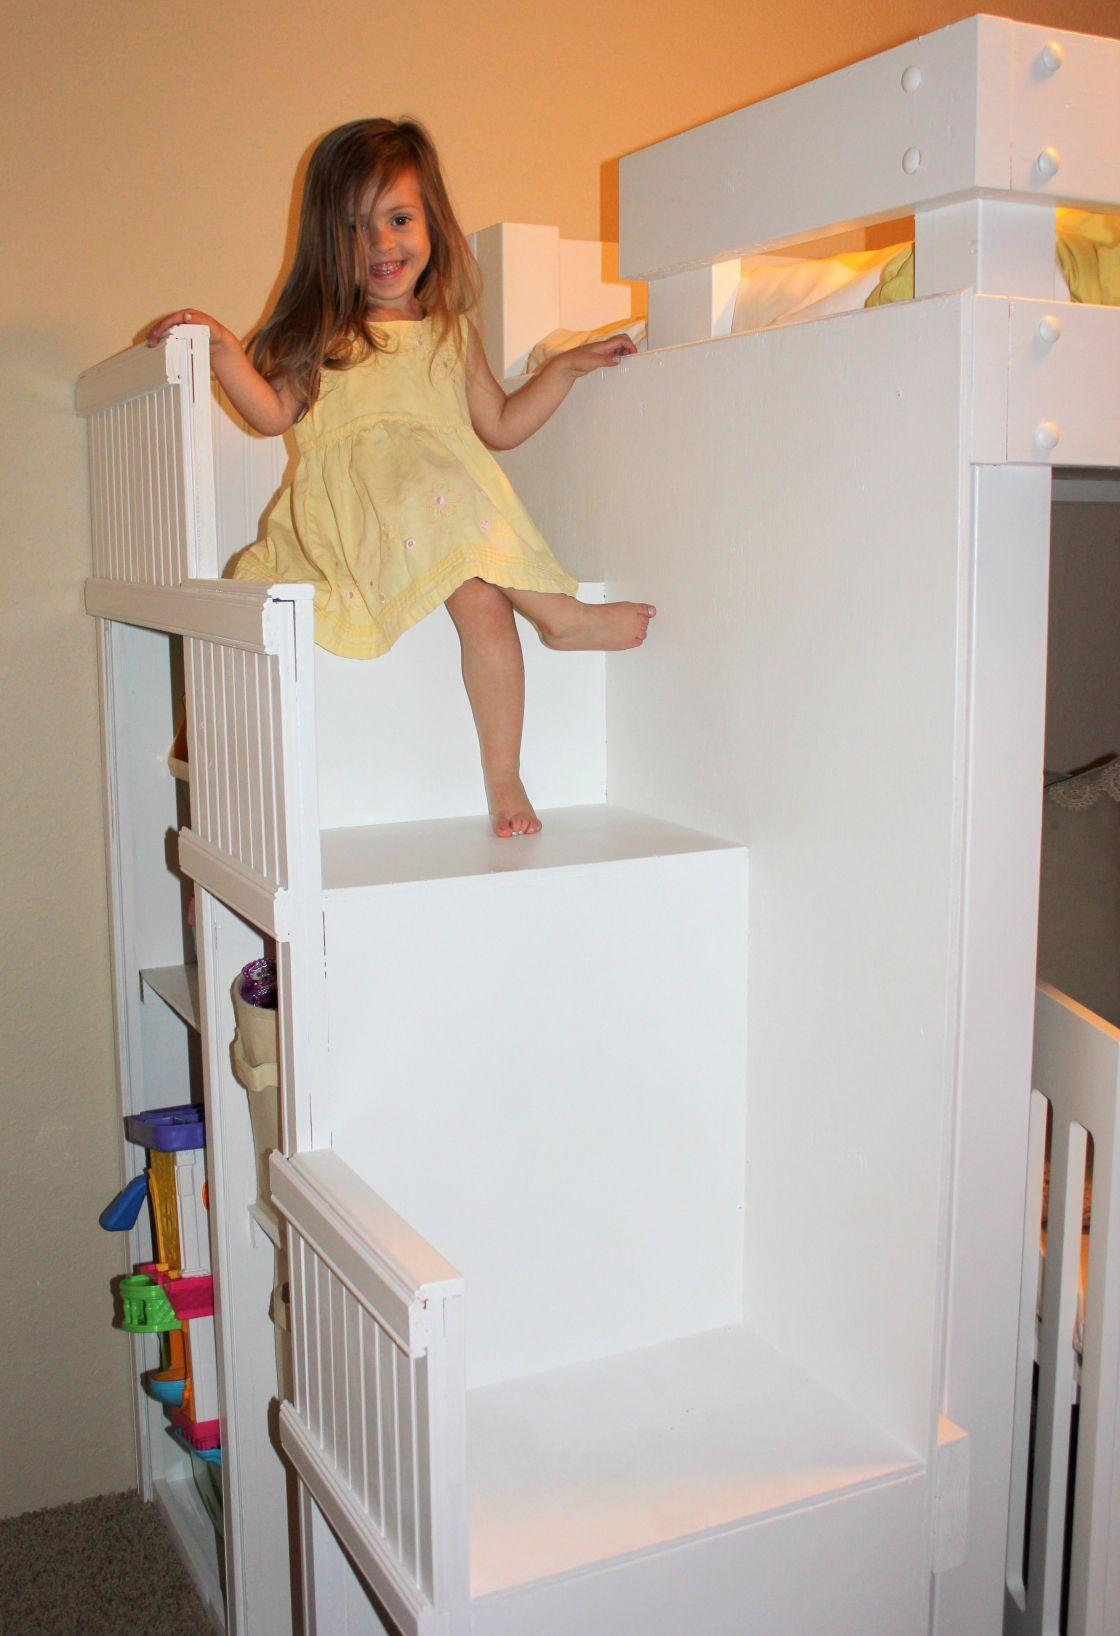 diy bunk beds Bunk beds, Diy bed, Bed